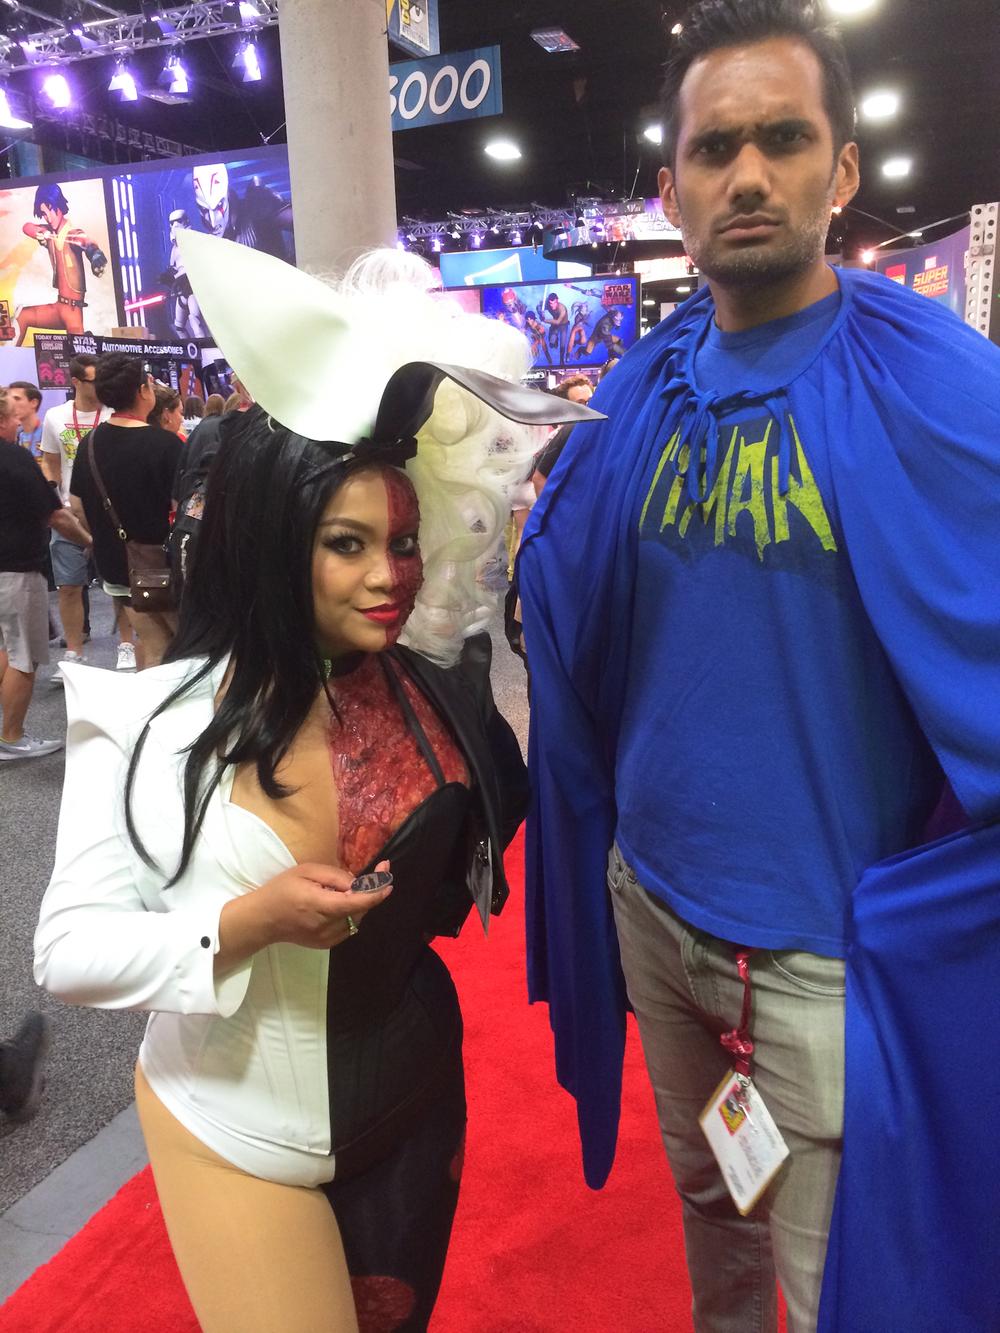 batman-two-face-gender-bending-cosplay-san-diego-comic-con.jpg